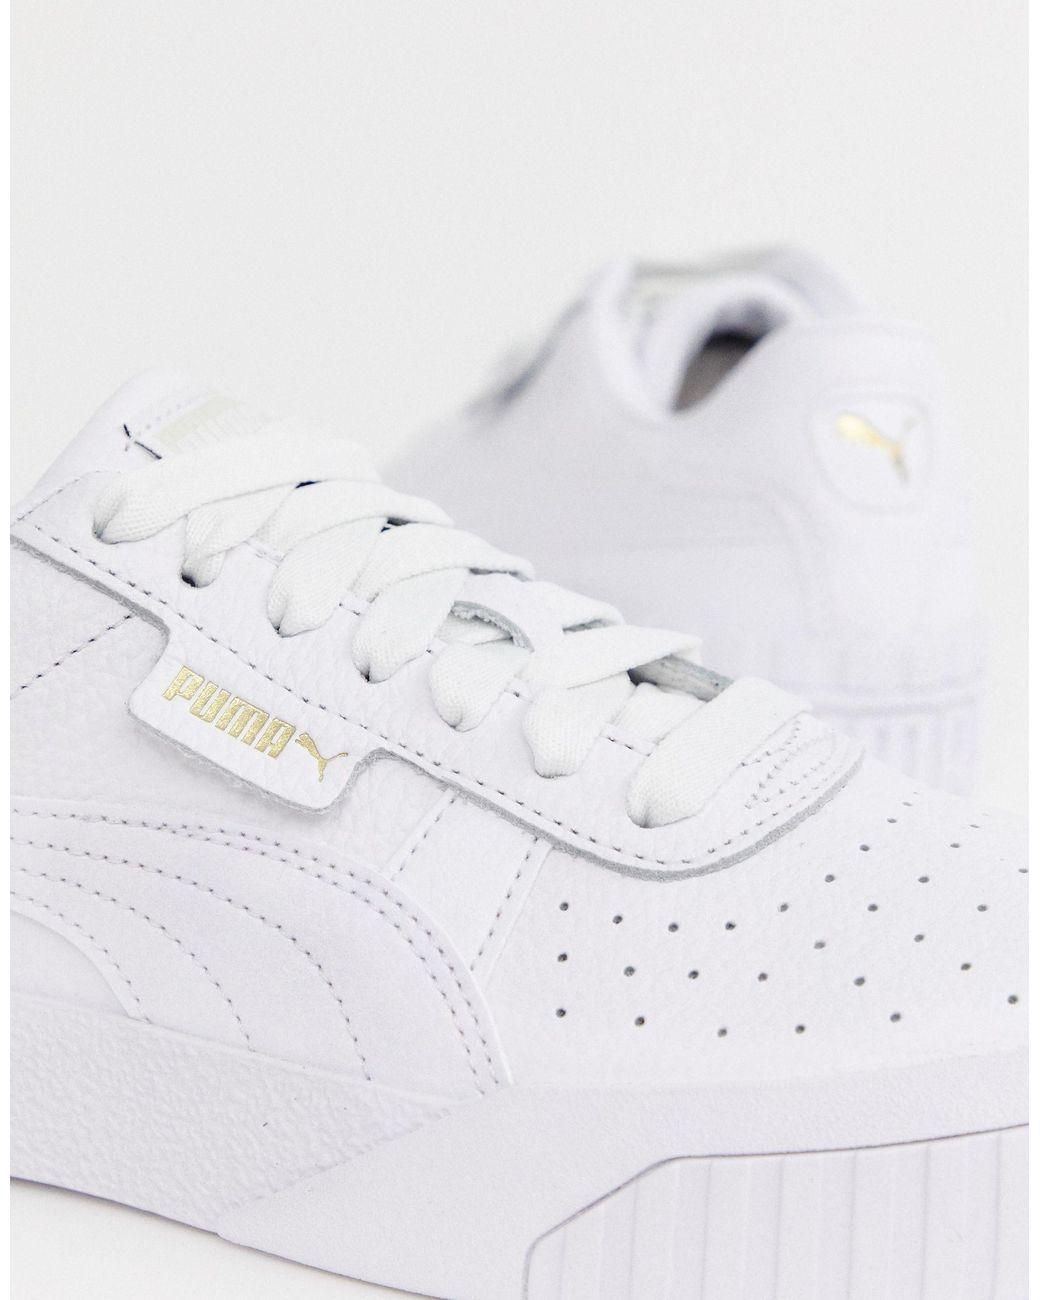 PUMA Leather Cali Sneakers in White